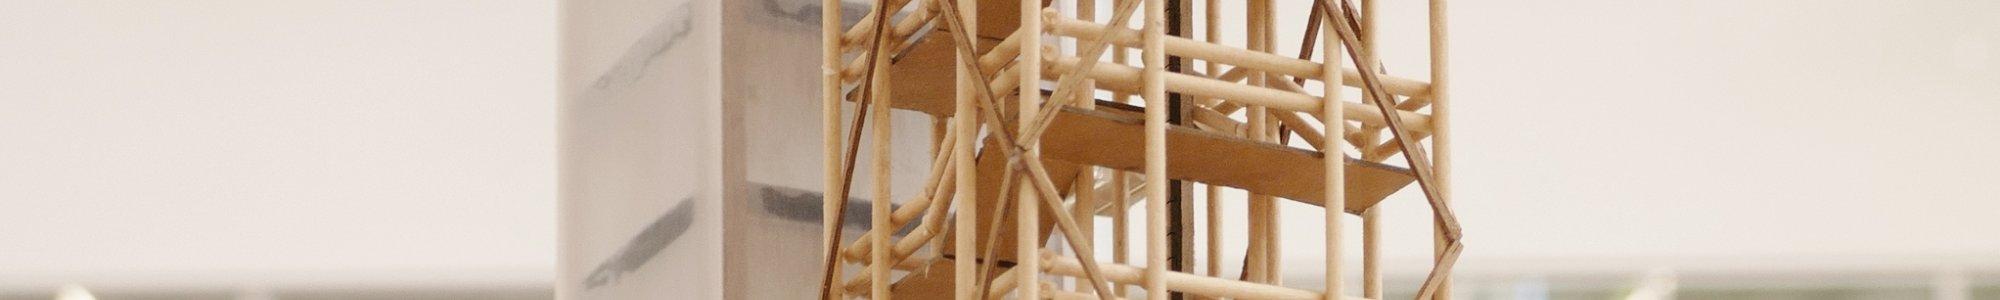 Architekturmodell Demonstrator im Maßstab 1:200